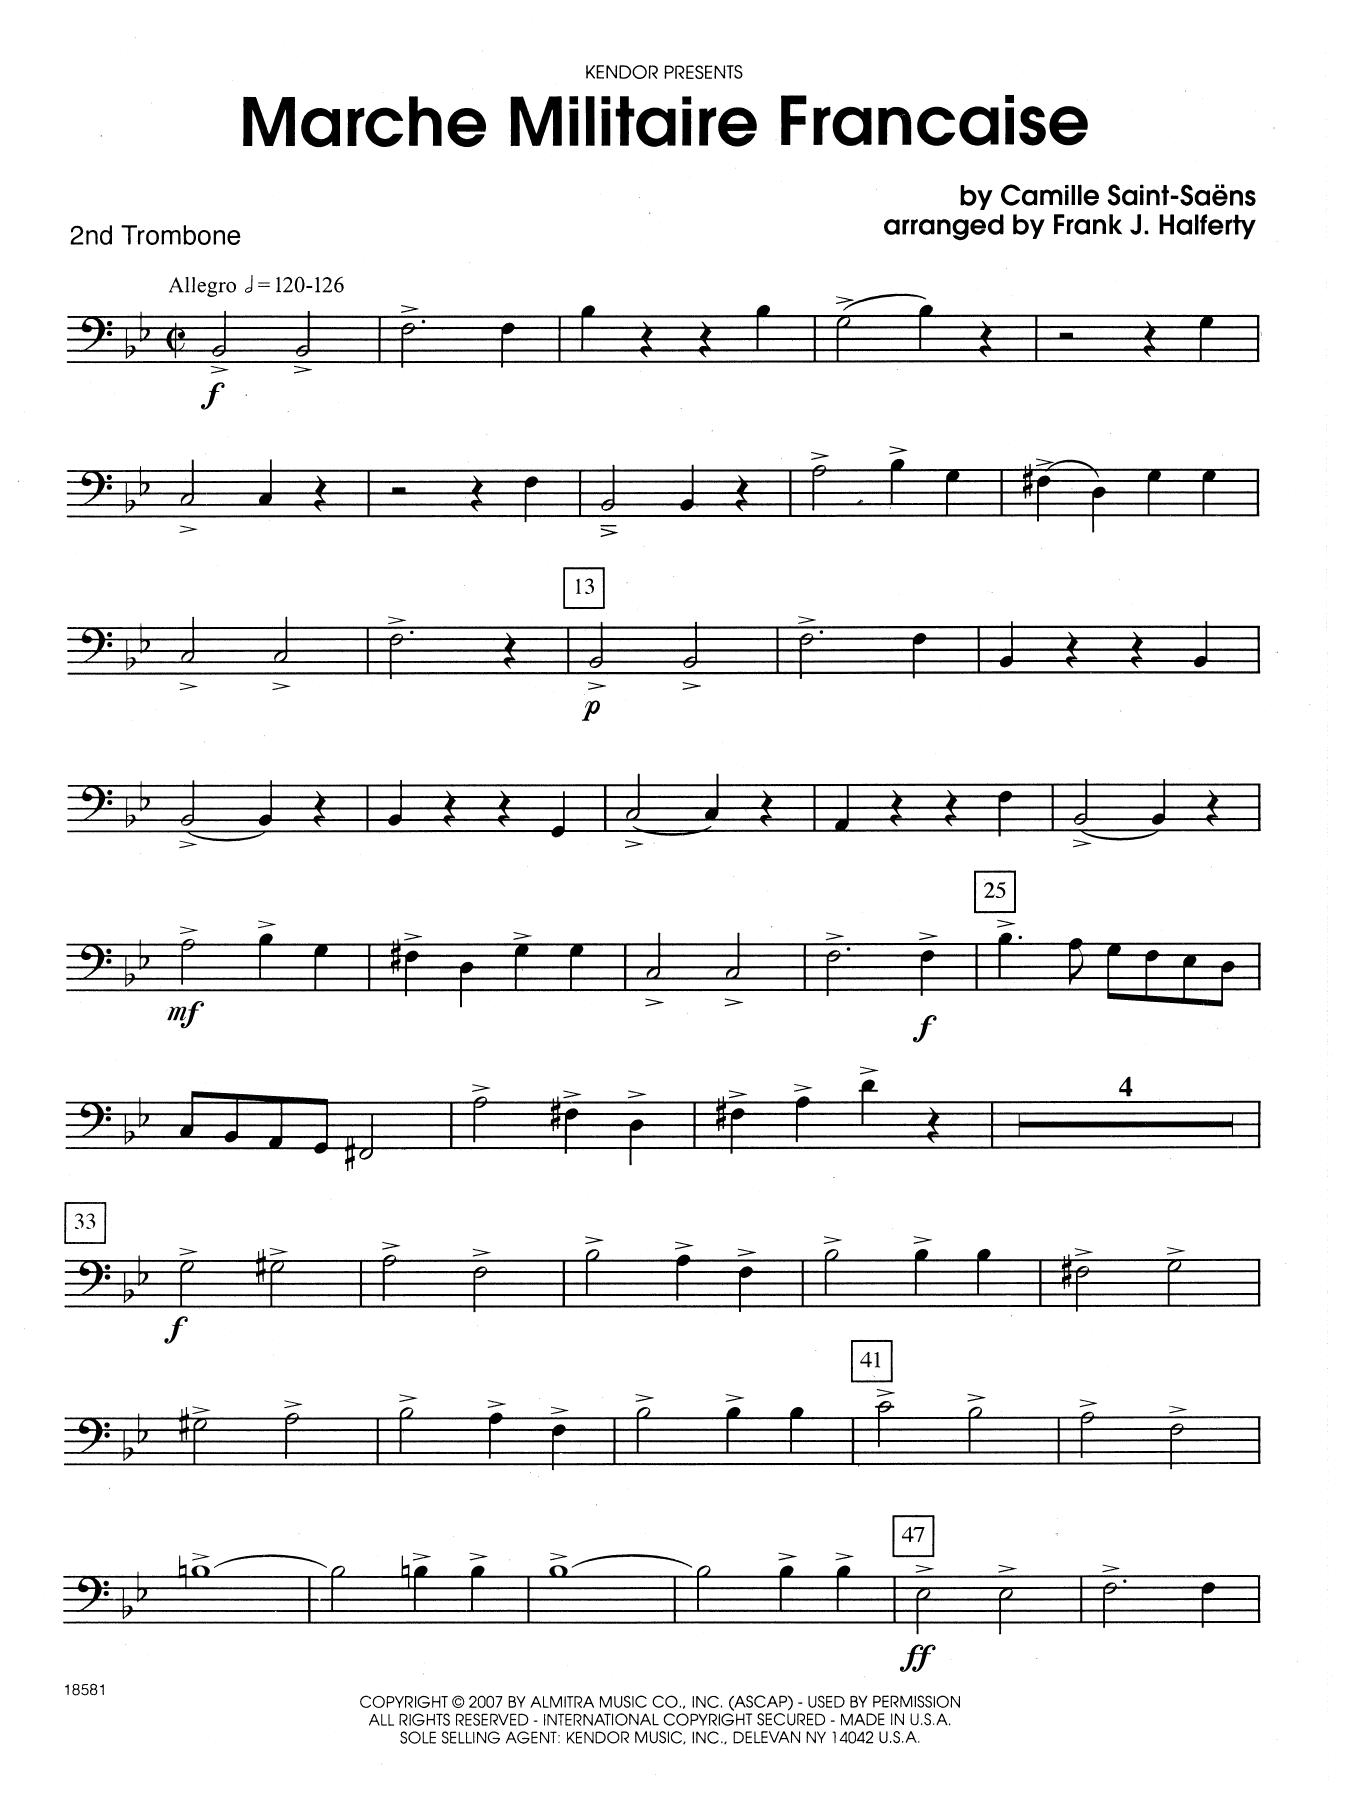 Marche Militaire Francaise - 2nd Trombone Sheet Music